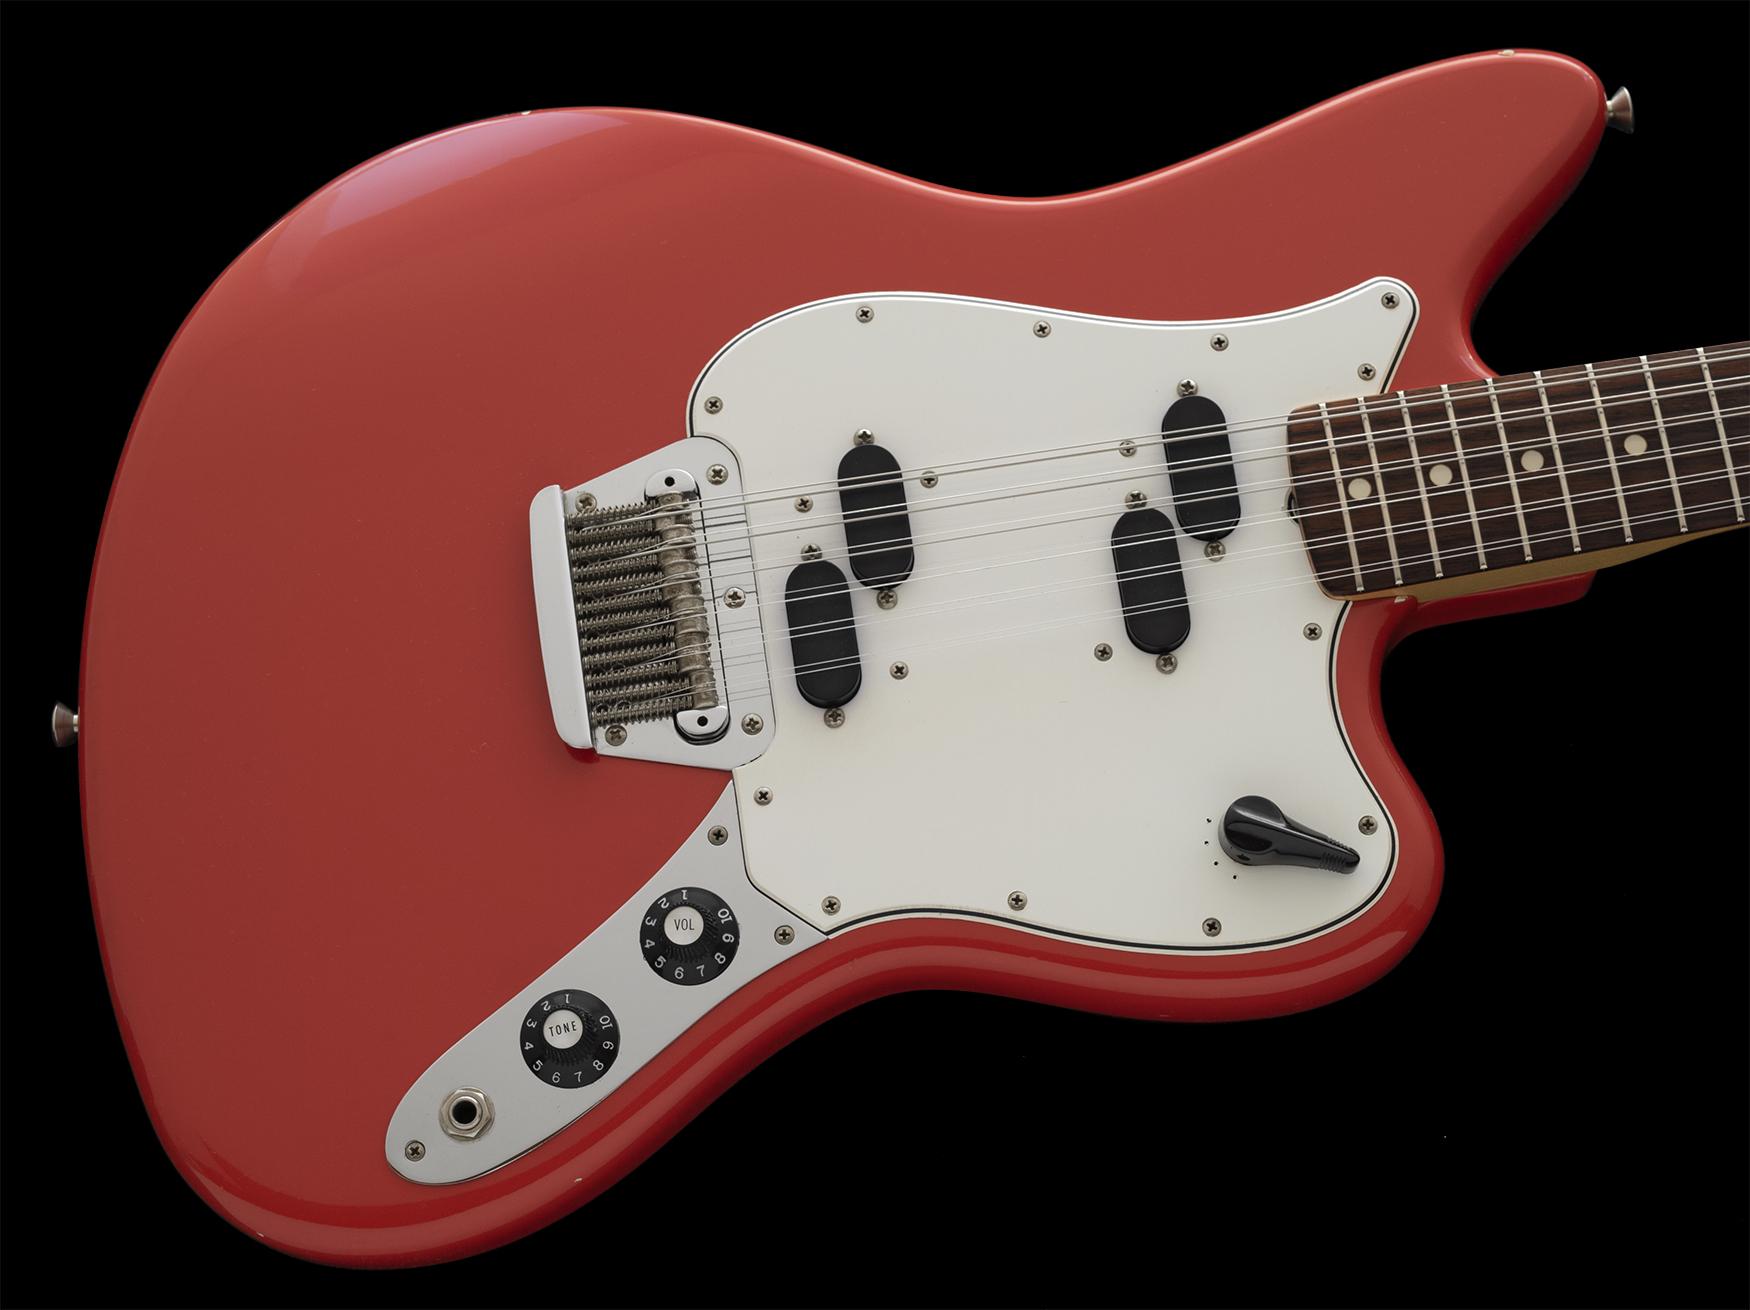 1966 Fender XII, Fiesta Red, Beautiful Example